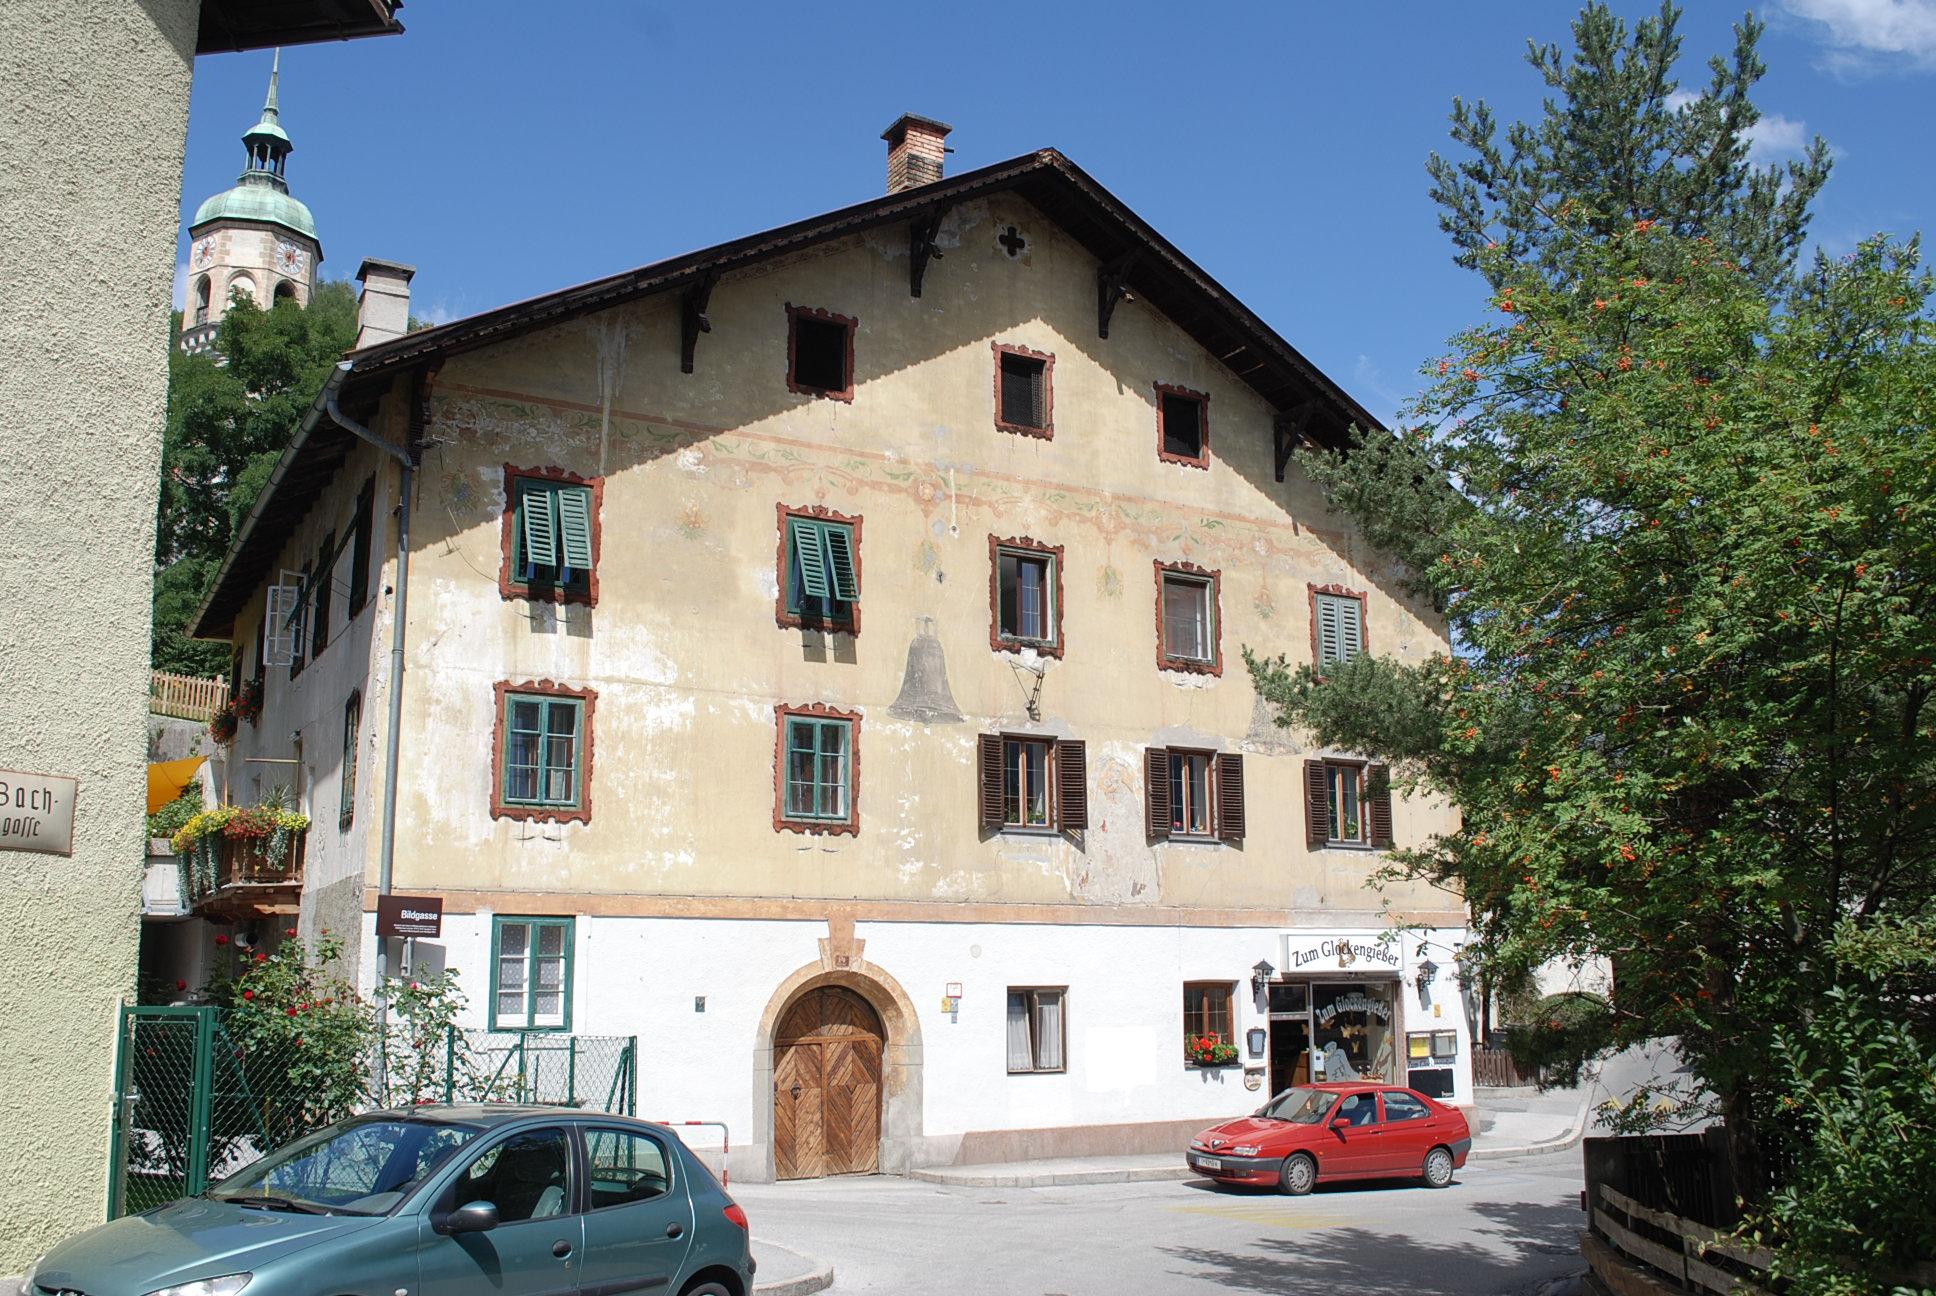 Kontaktanzeigen Htting (Innsbruck) | Locanto Dating